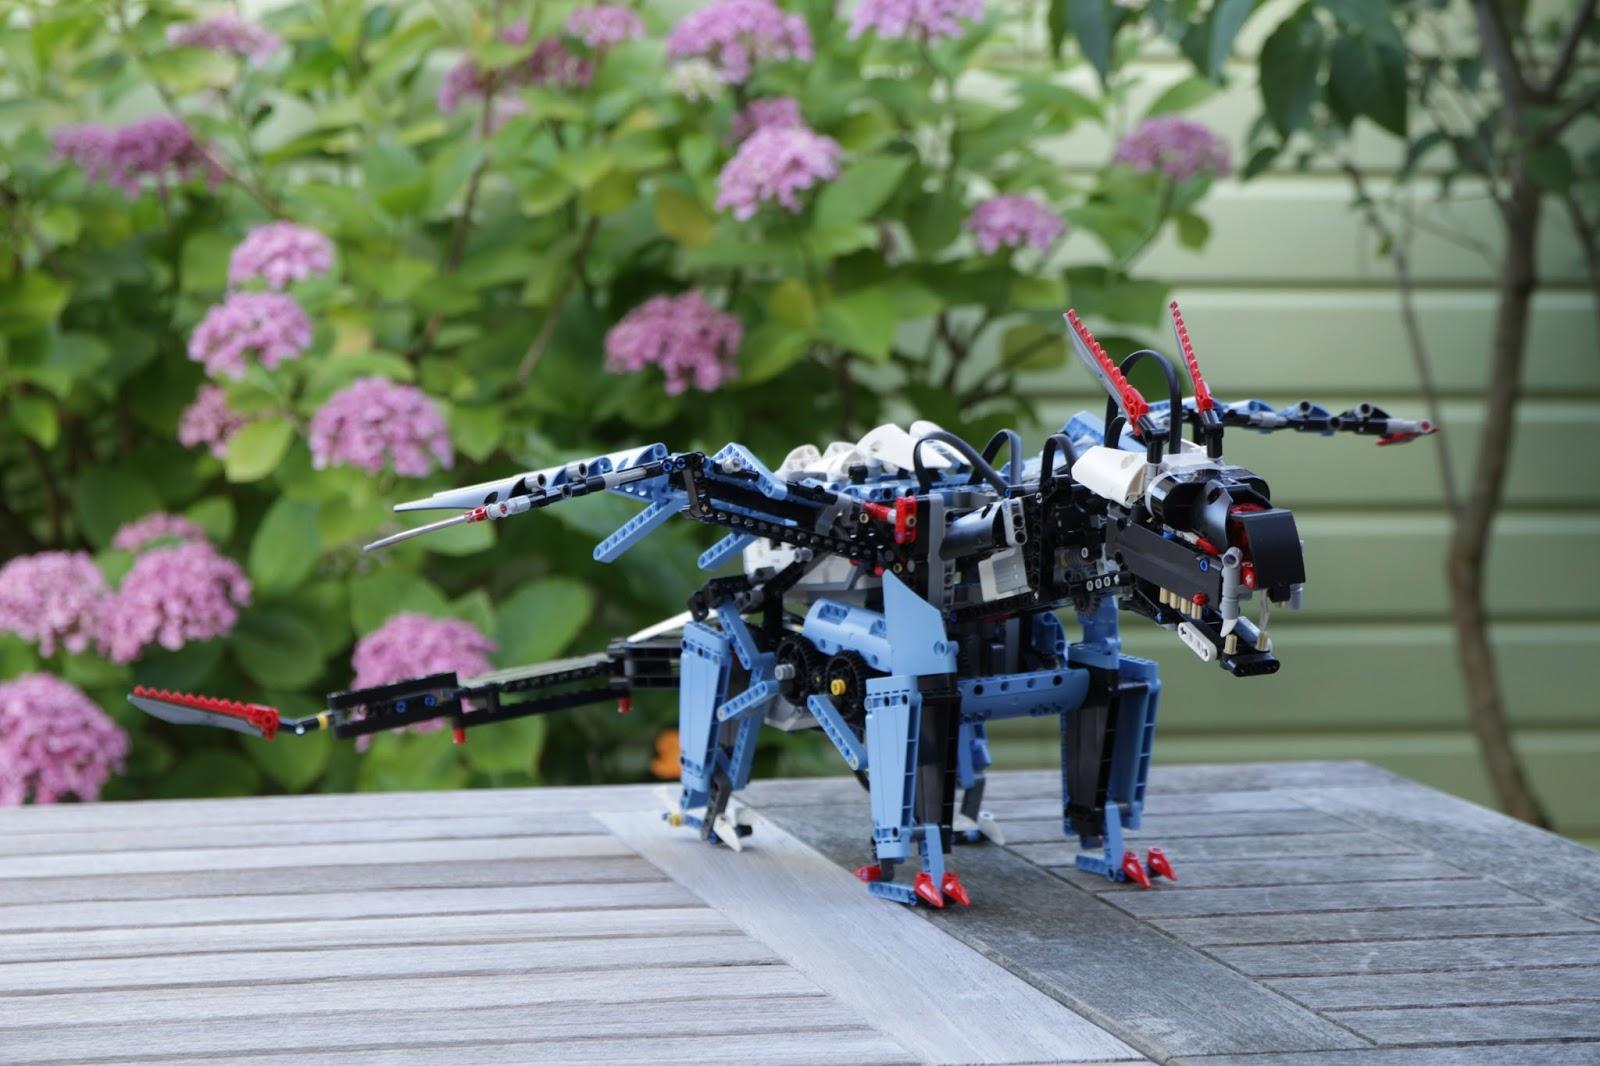 Saphiro: The Blue Dragon - Robot Remix #4 | The NXT STEP ...